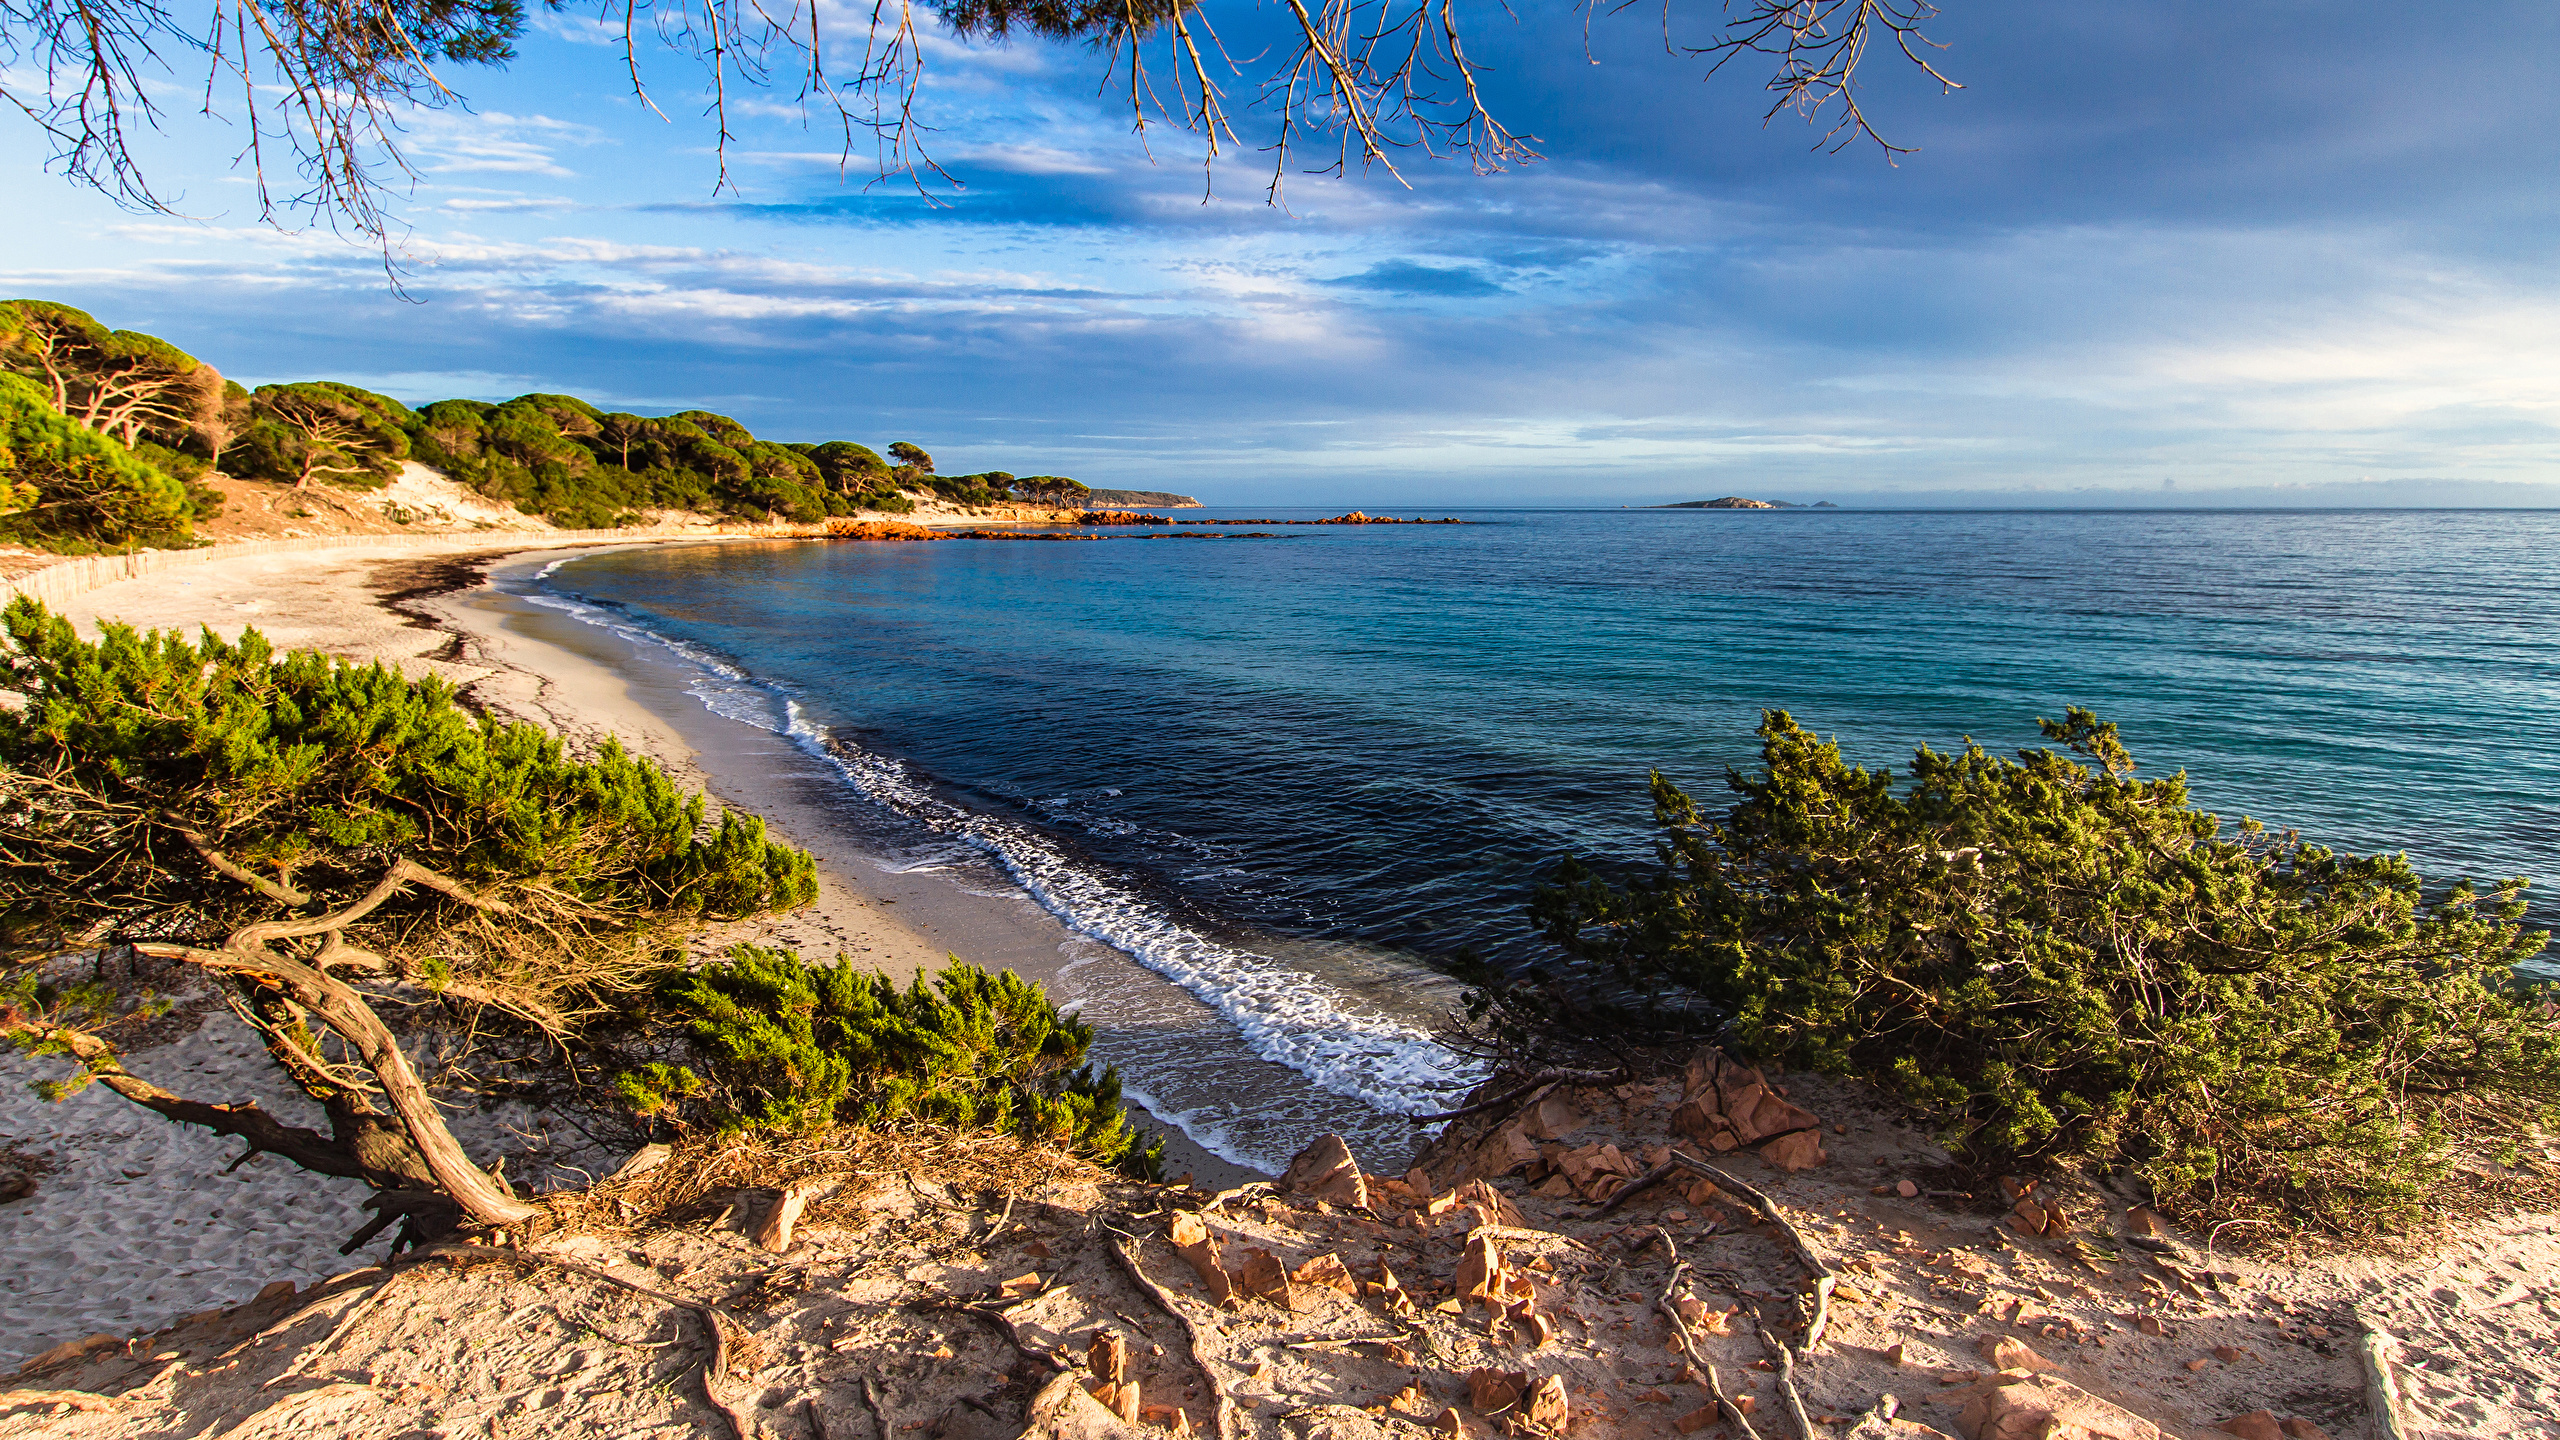 Desktop Wallpapers France Corsica Nature Waves Coast 2560x1440 2560x1440